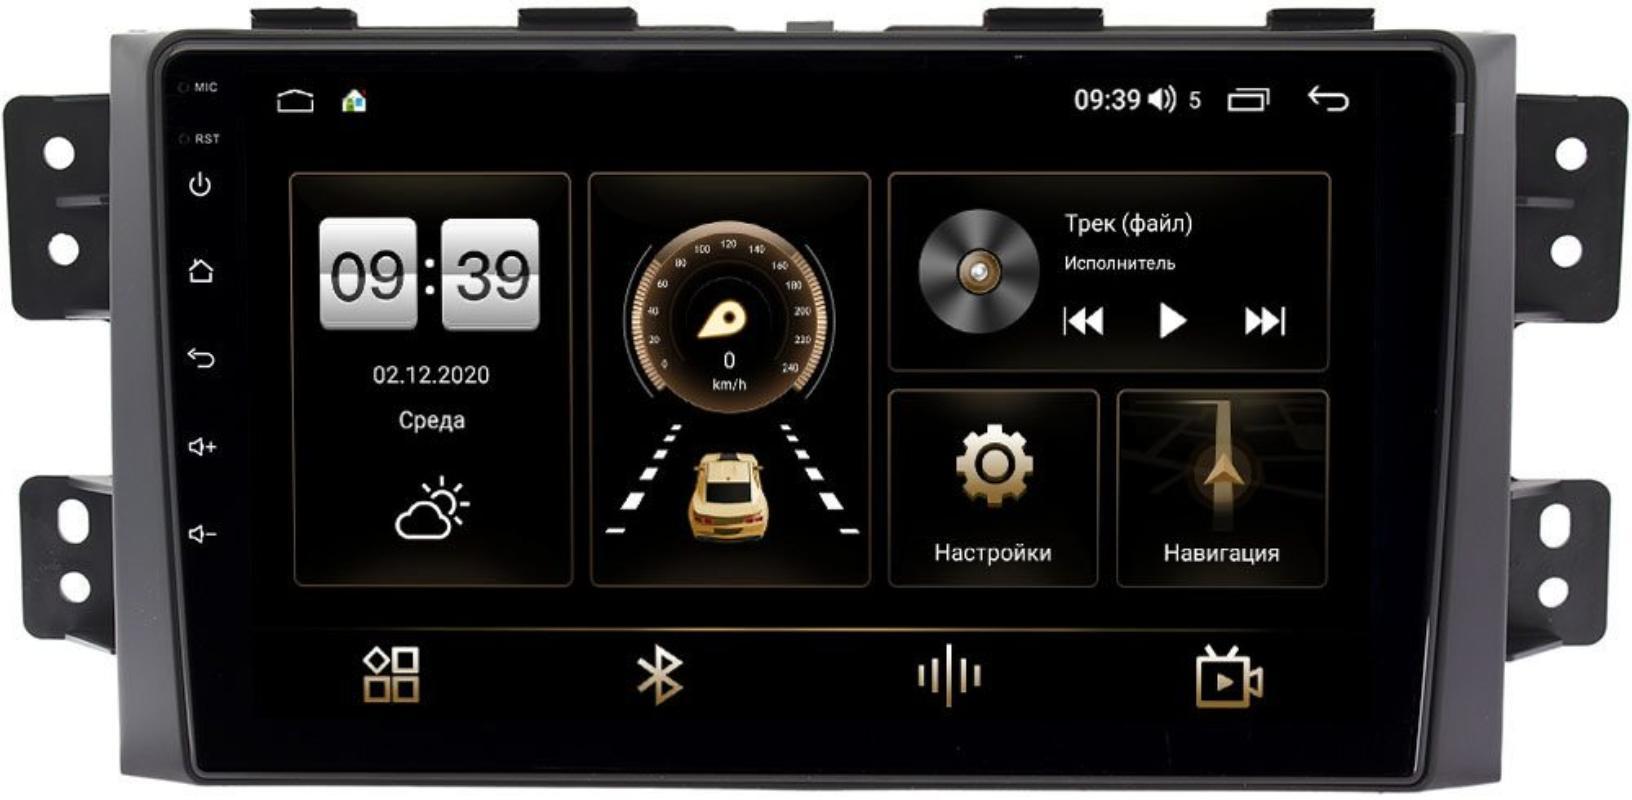 Штатная магнитола Kia Mohave I 2008-2018 LeTrun 4166-9142 на Android 10 (4G-SIM, 3/32, DSP, QLed) (+ Камера заднего вида в подарок!)